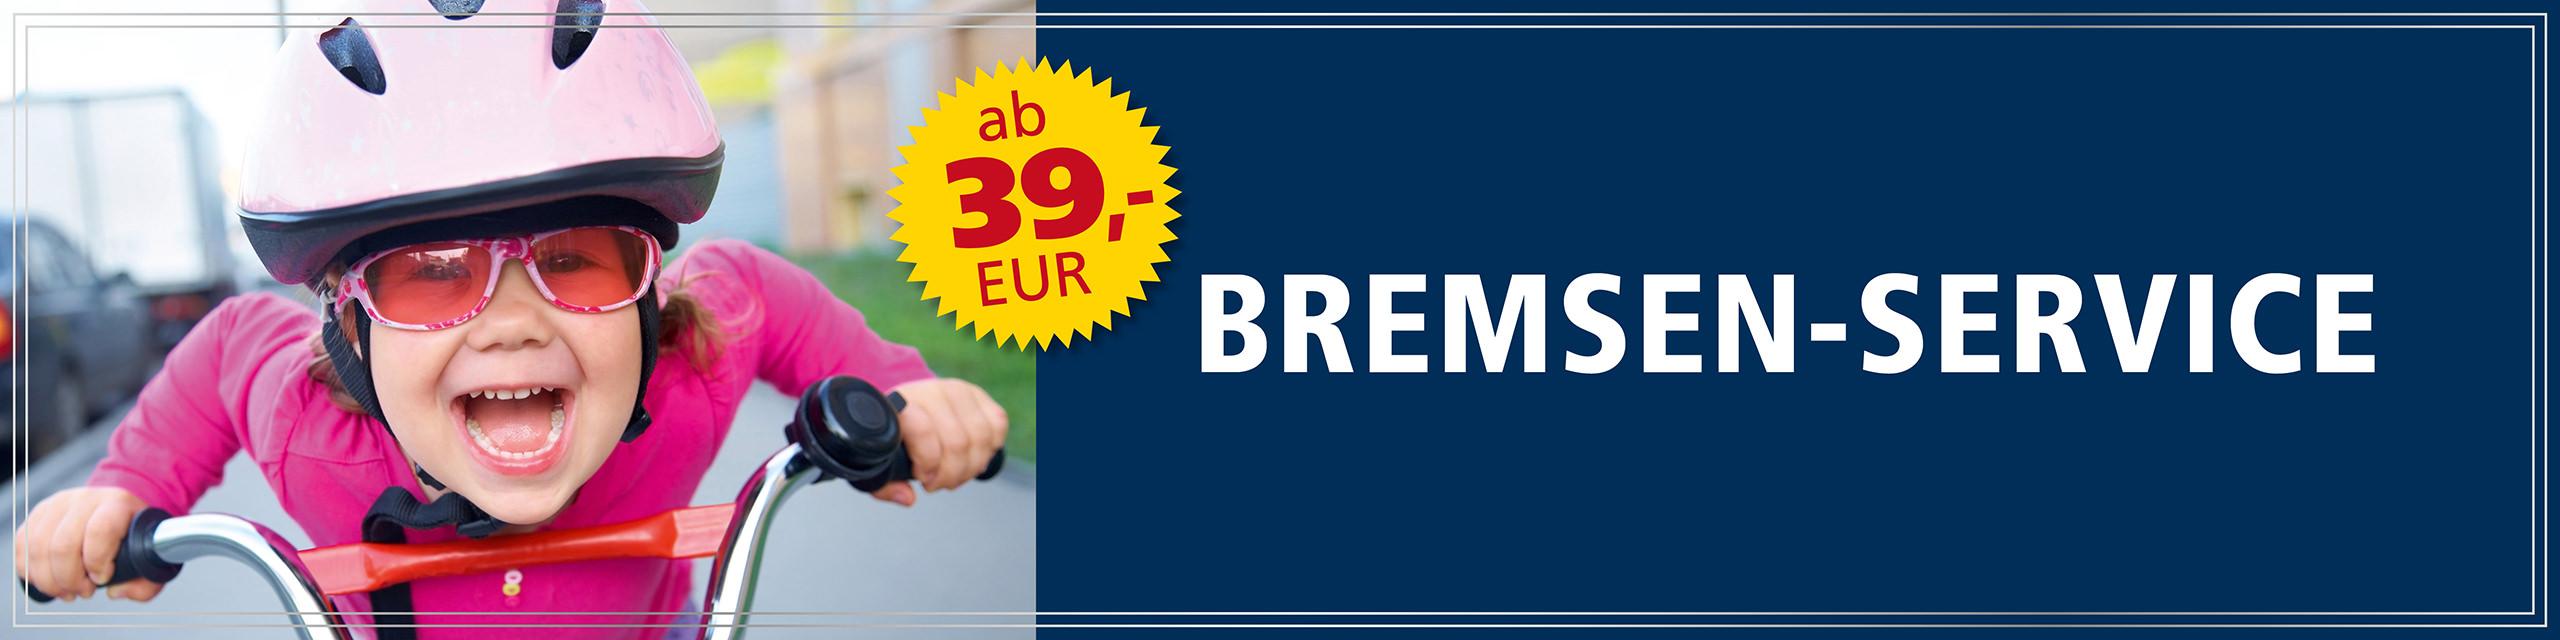 Bremsen-Service ab 39,- €